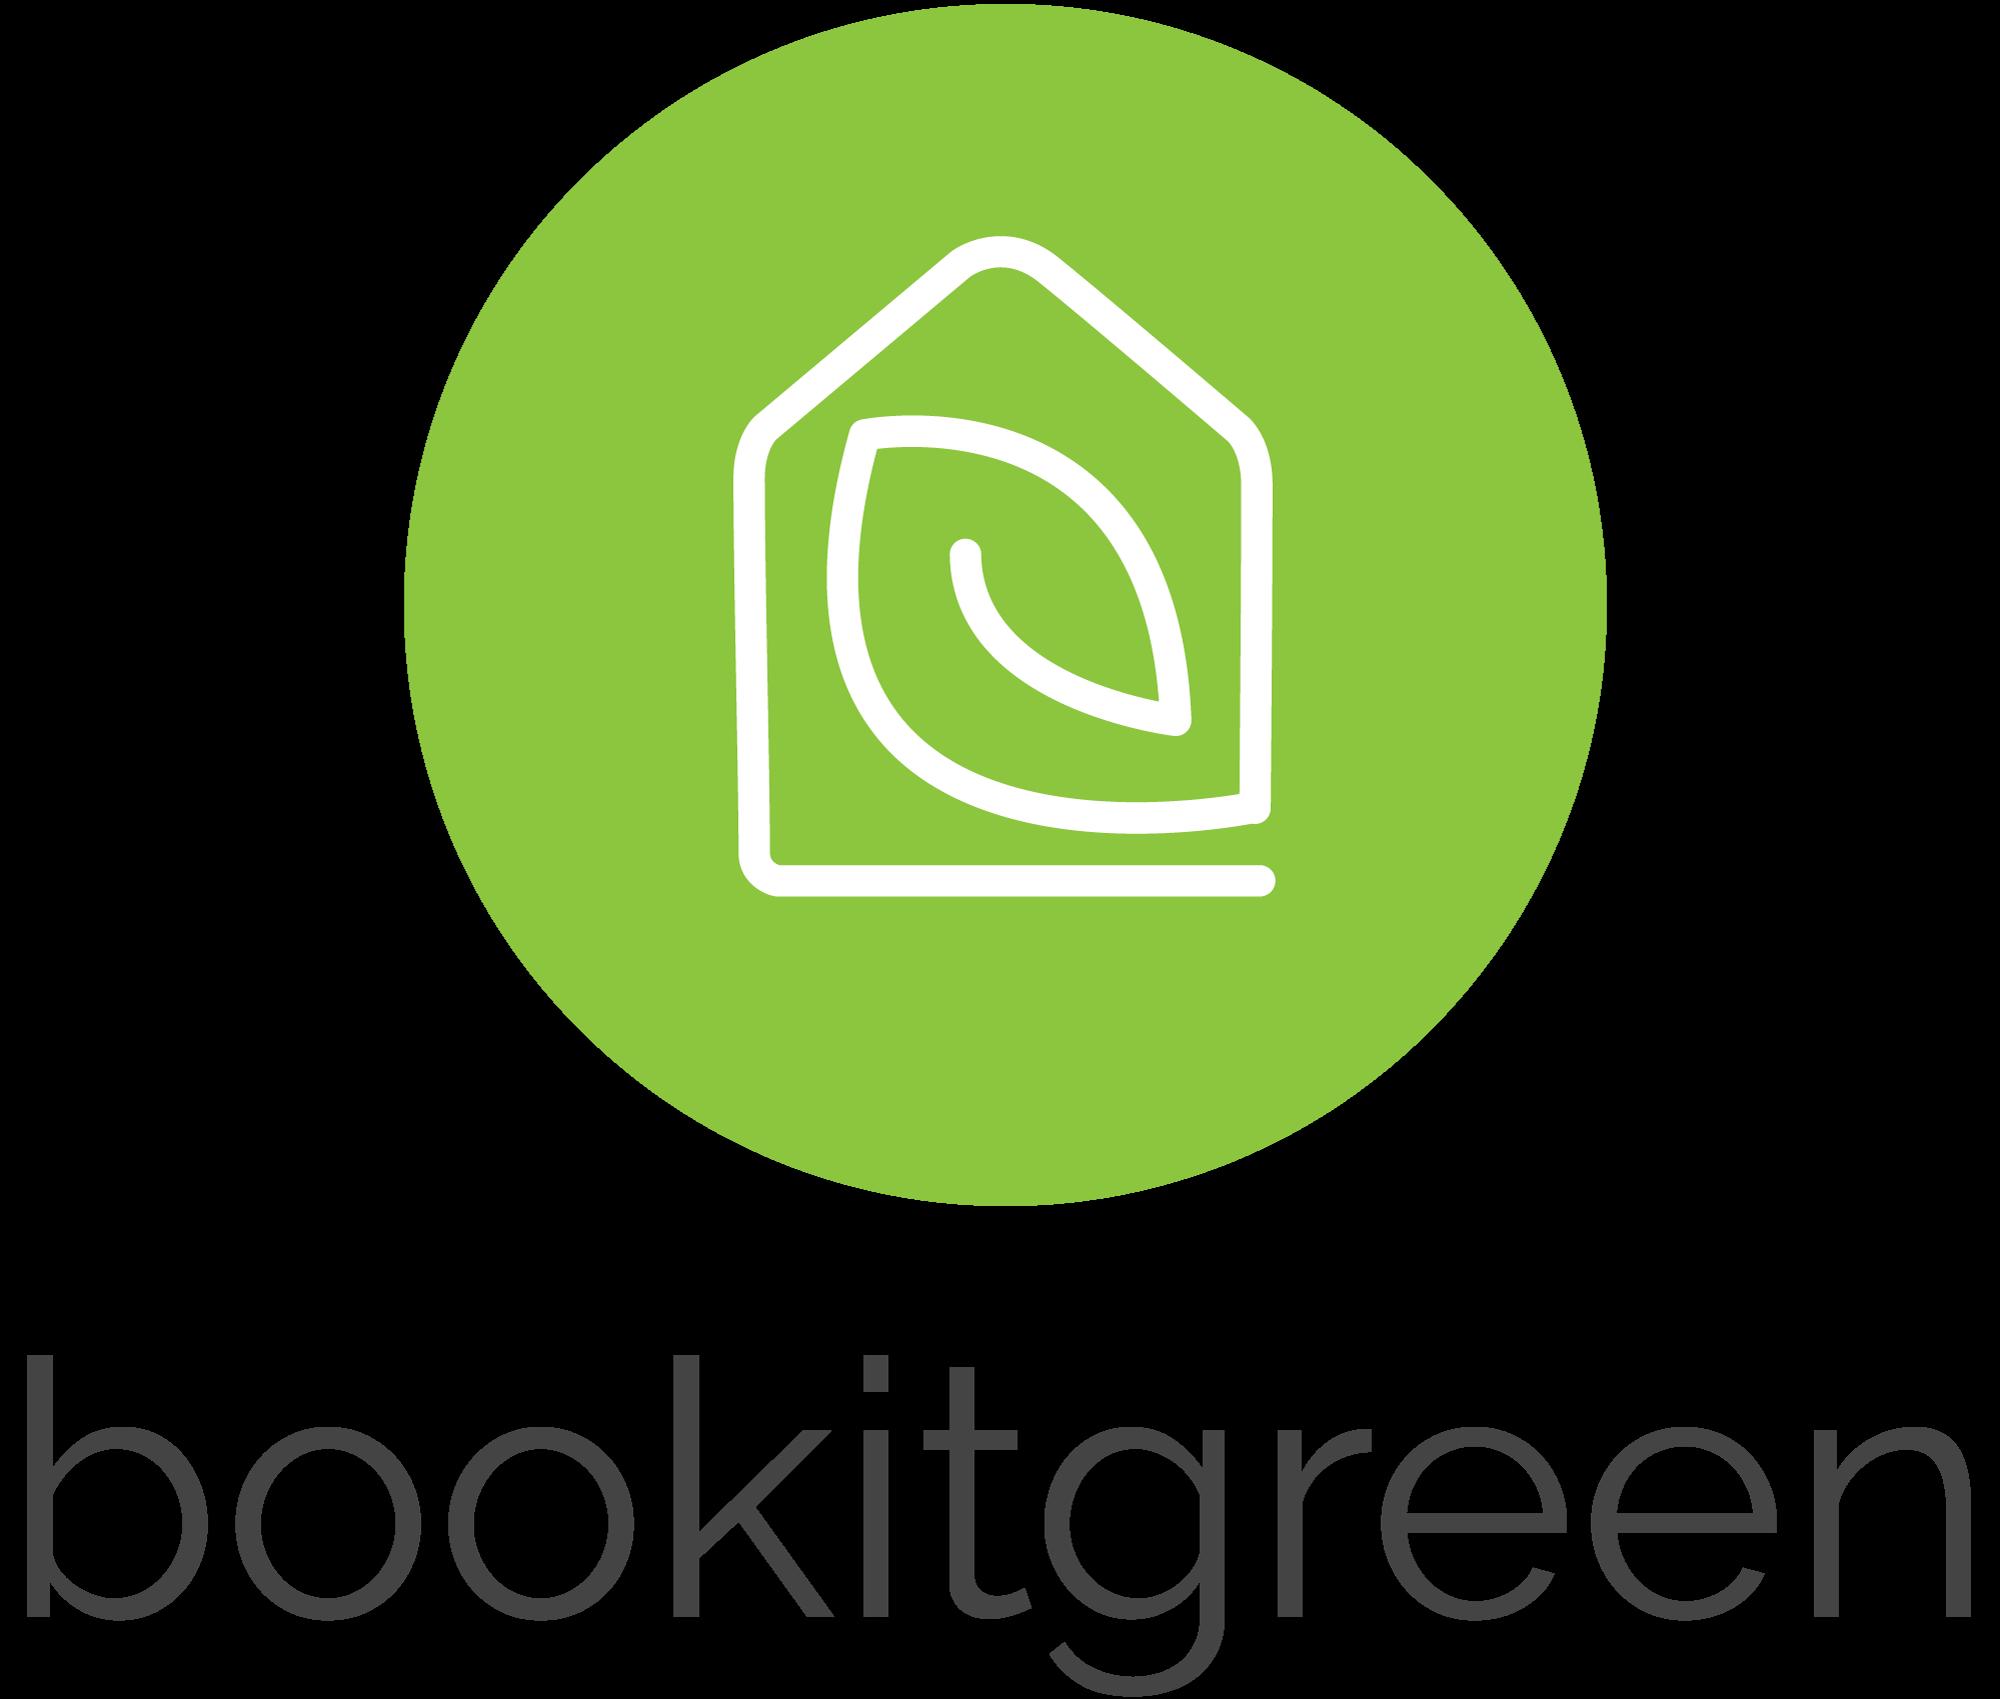 Bookitgreen - sustainable accommodations in Europe